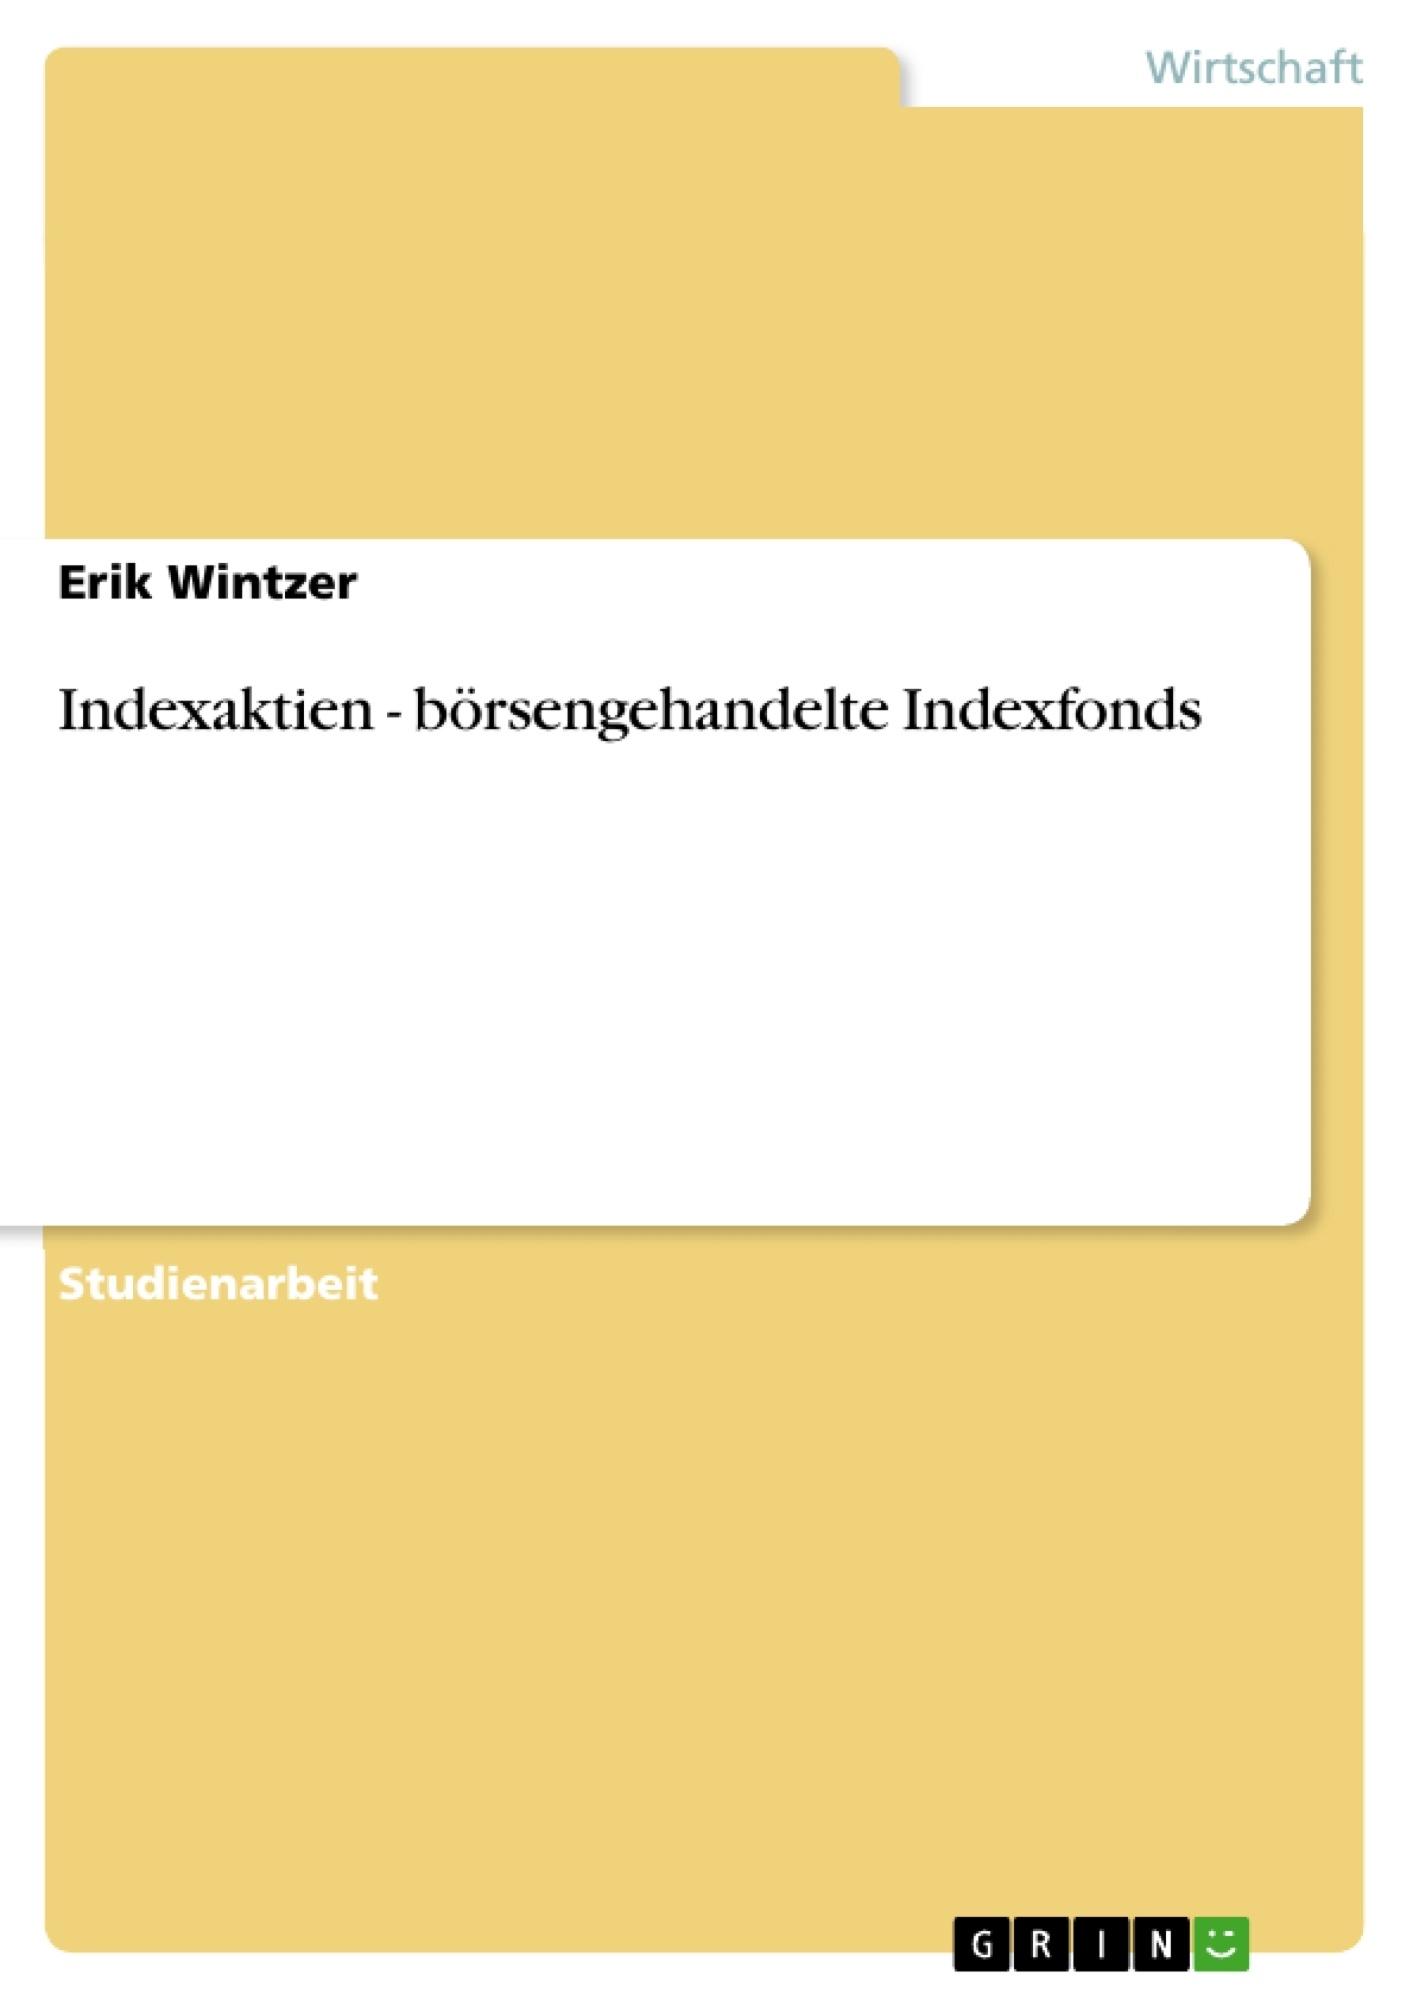 Titel: Indexaktien - börsengehandelte Indexfonds